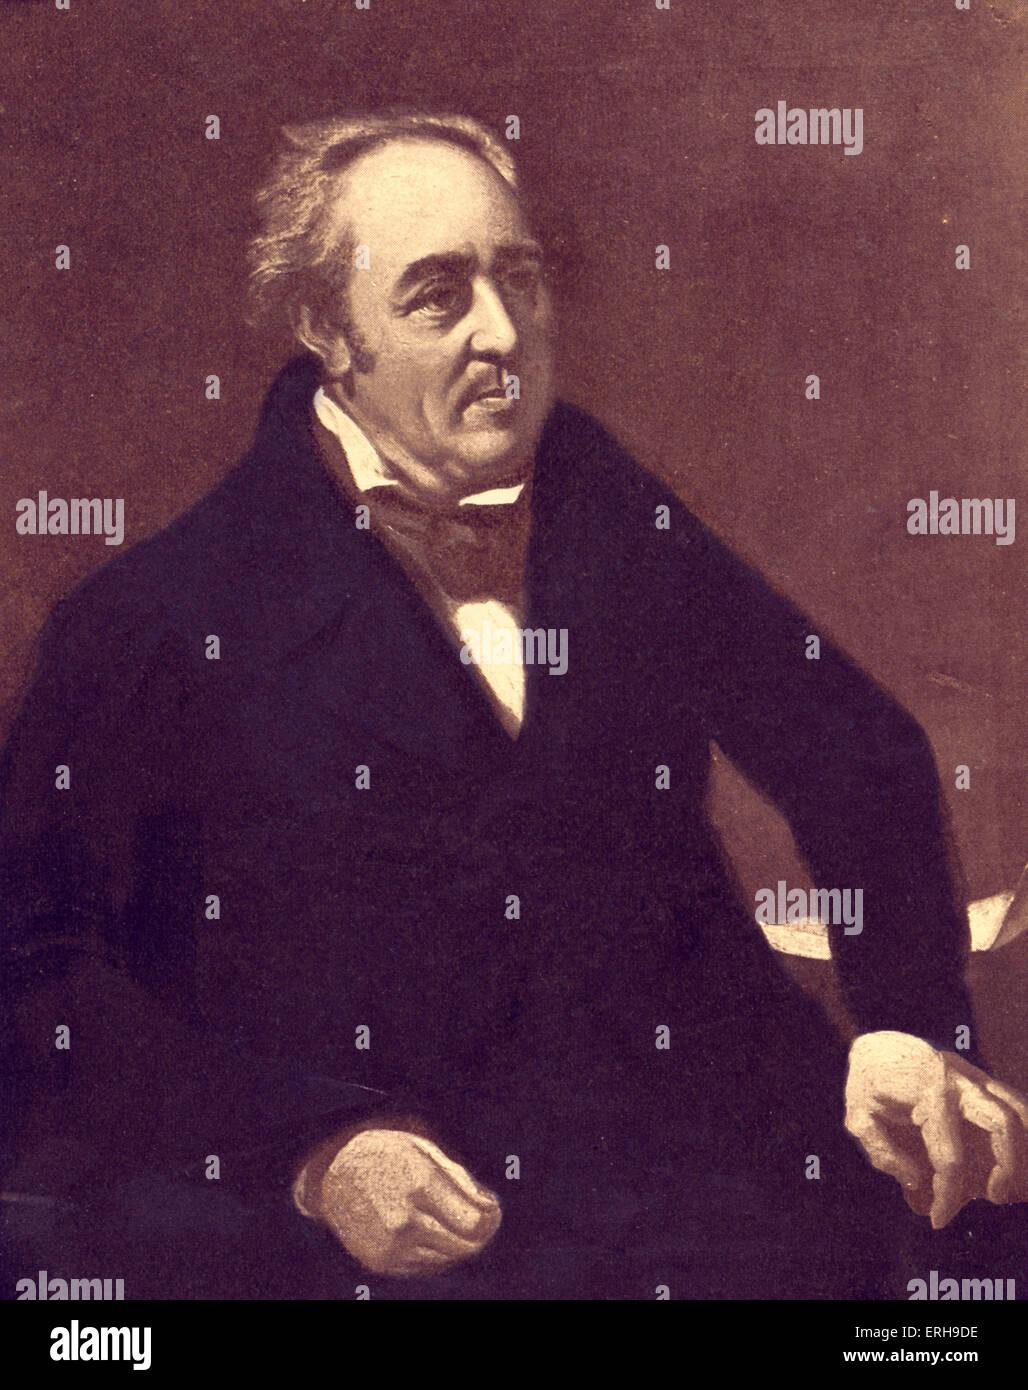 Walter Savage Landor - portrait. English writer and poet. 30 January 1775 – 17 September 1864. - Stock Image